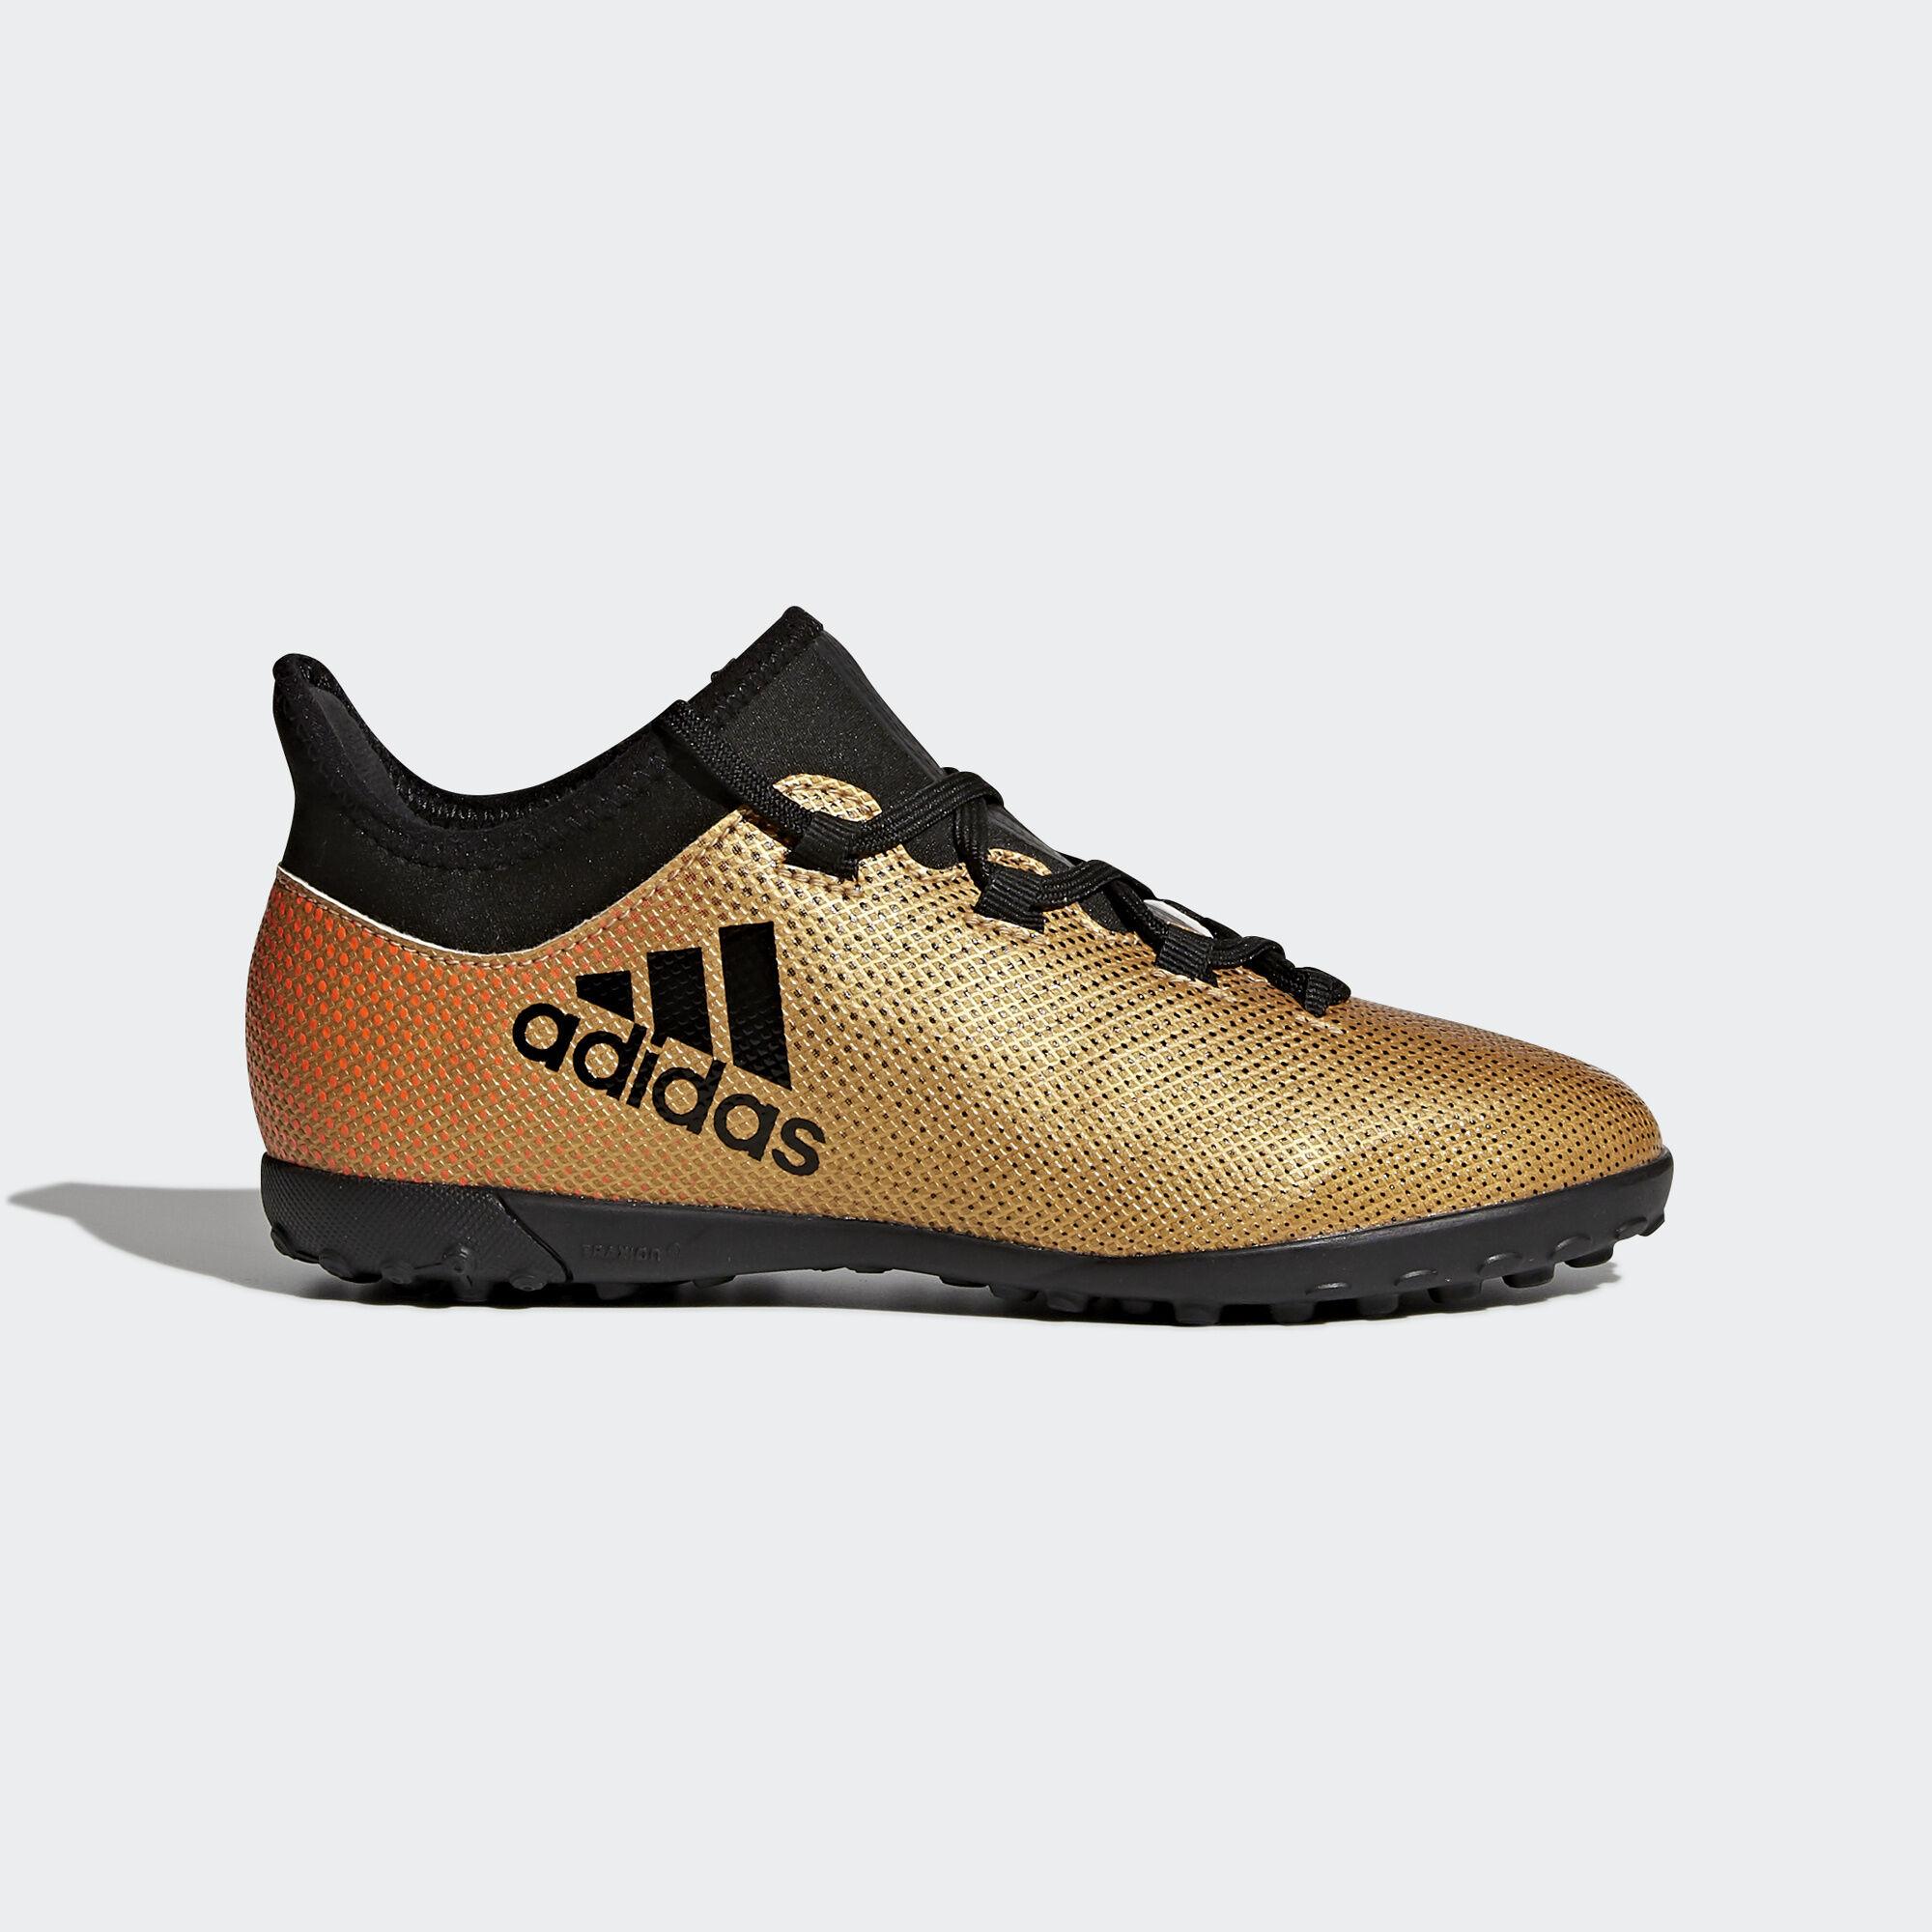 Boots Tango 3 EuropeAfrica adidas Gold adidas X Turf 17 O4BgxzwPq